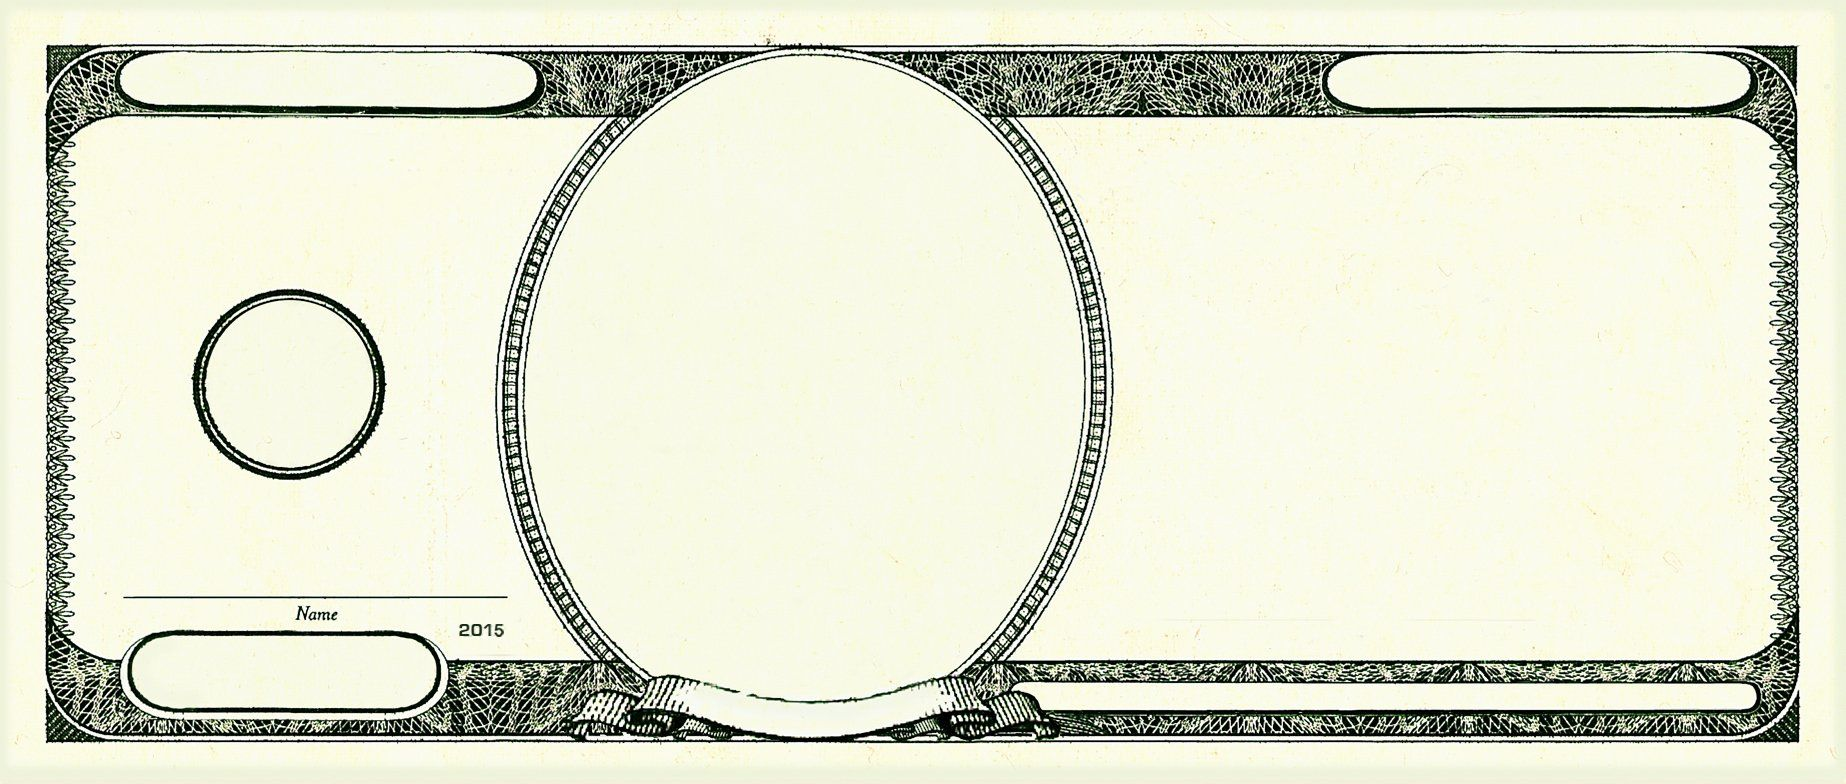 Dollar Bill Photoshop Template